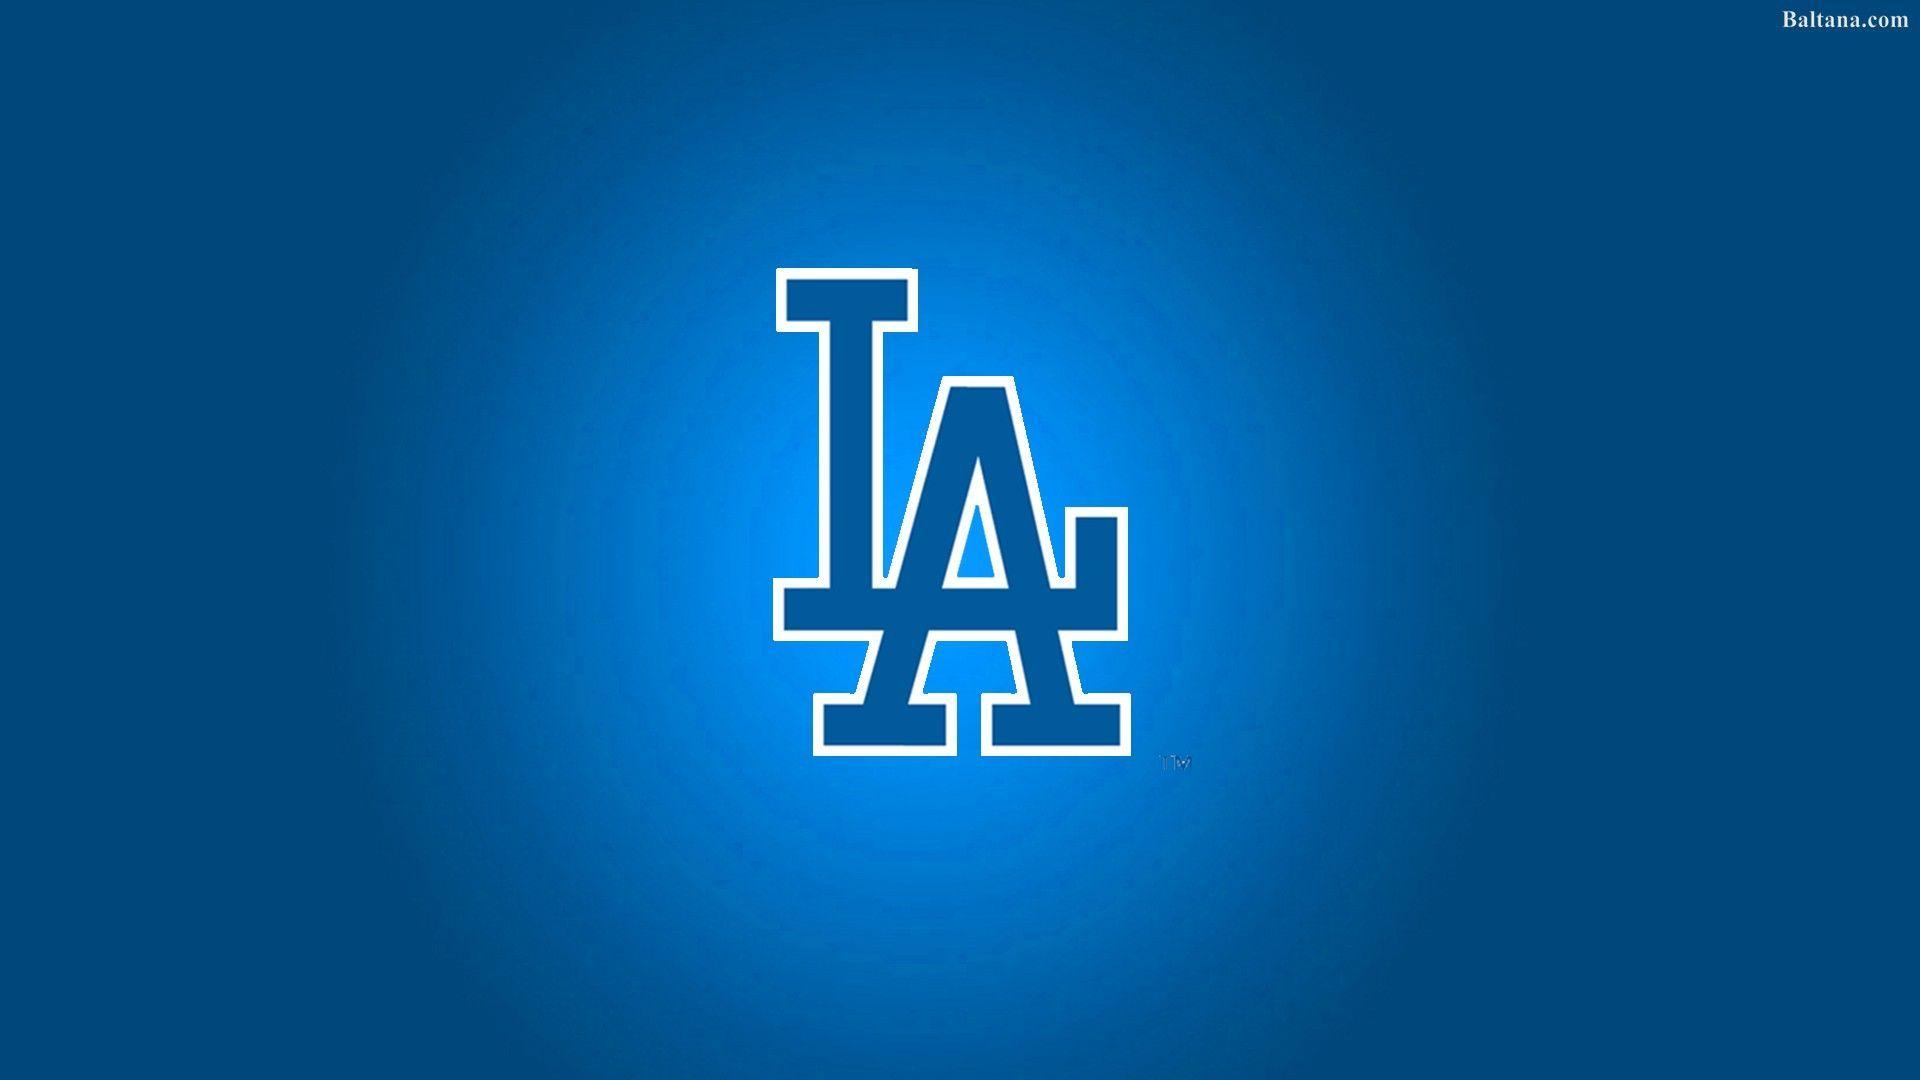 Dodgers Wallpaper Picture